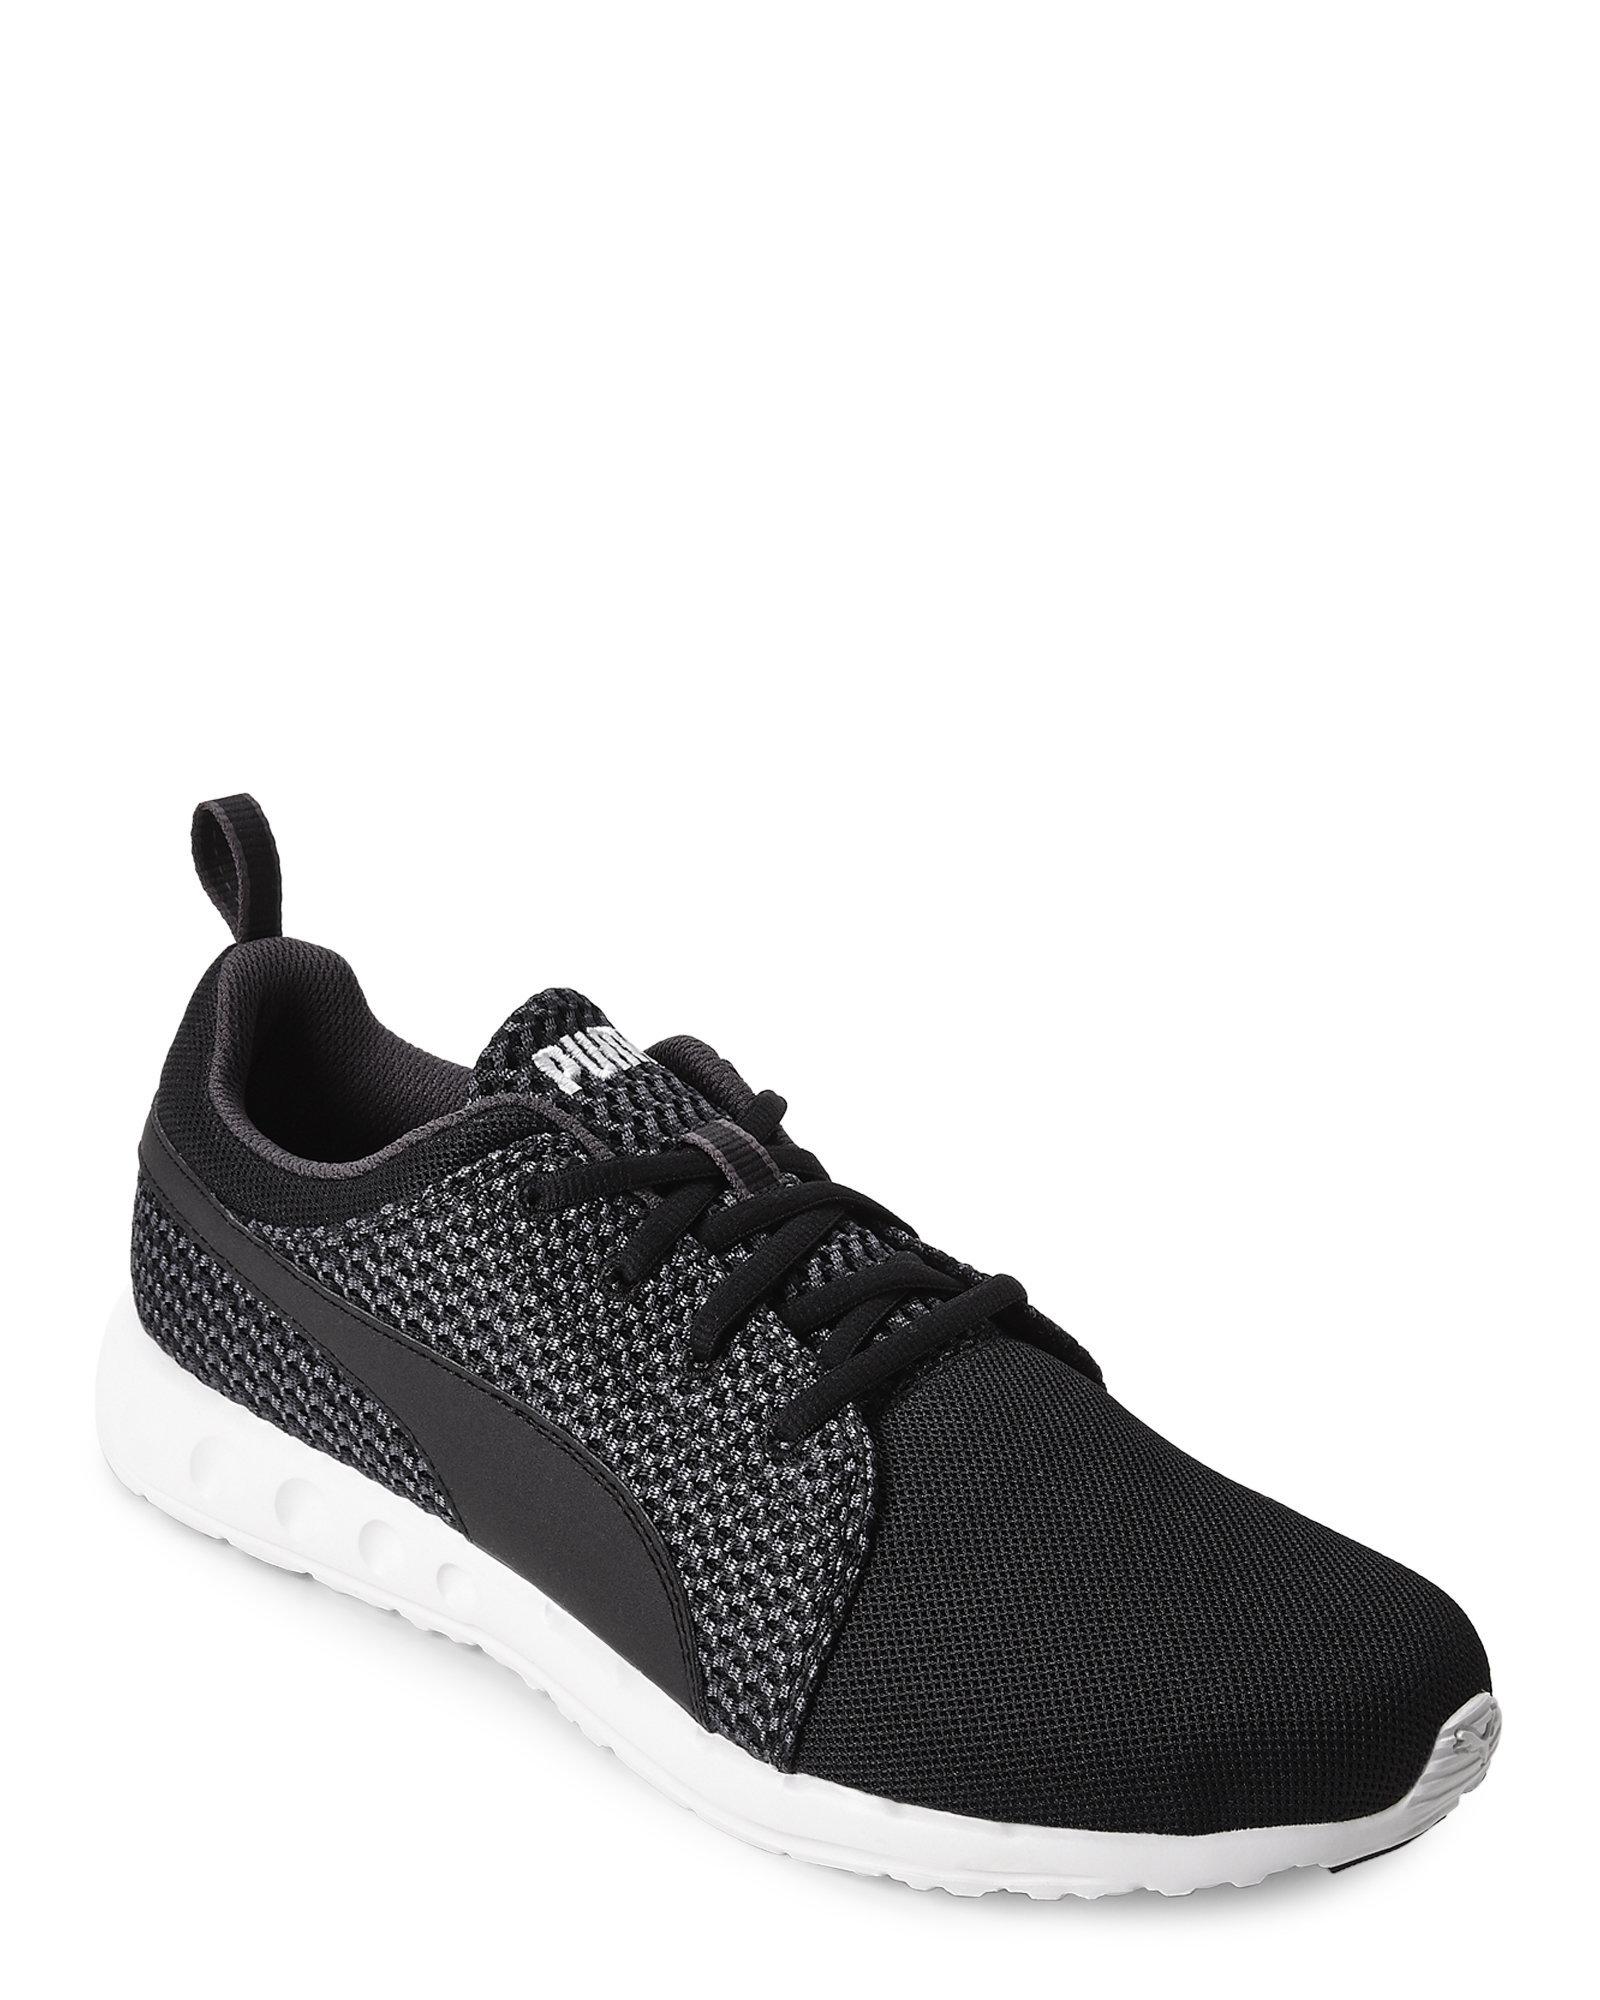 Lyst - PUMA Periscope   Black Carson Runner Knit Sneakers in Black ... 8aef5f156